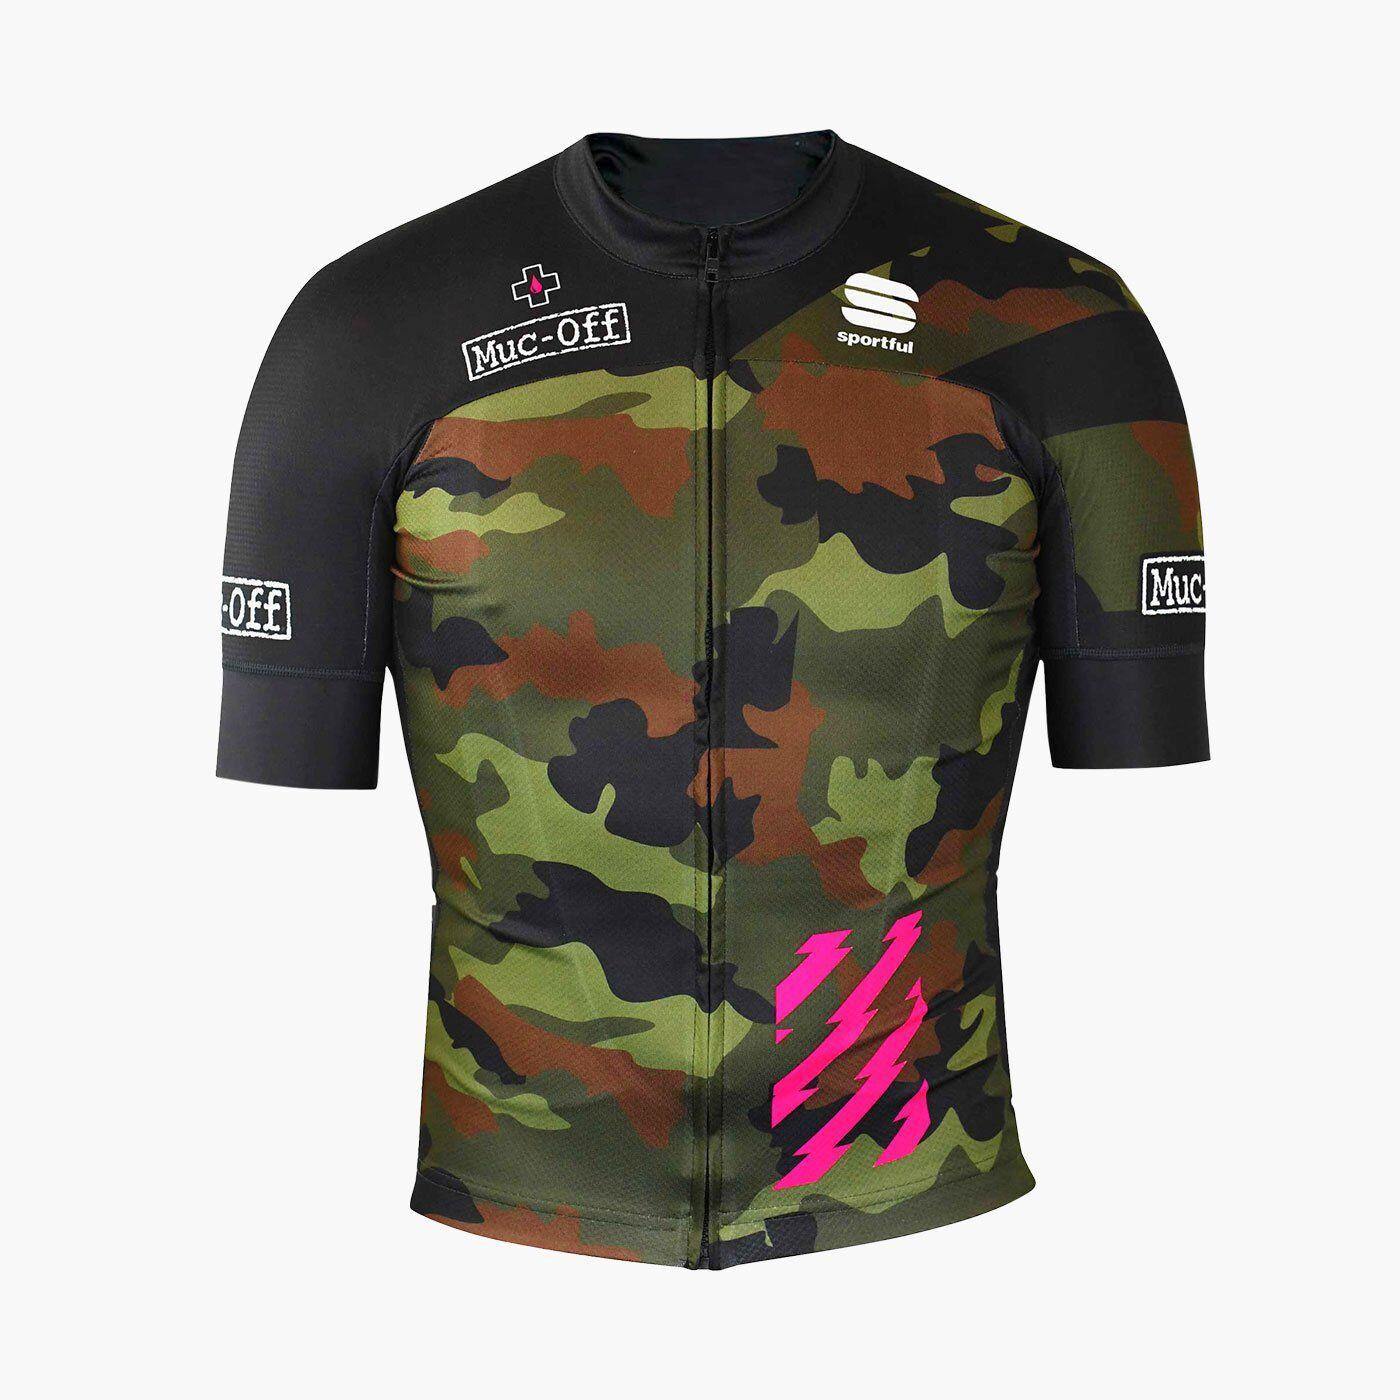 Muc-Off Sportful Bodyfit Pro 2.0 Team Jersey S